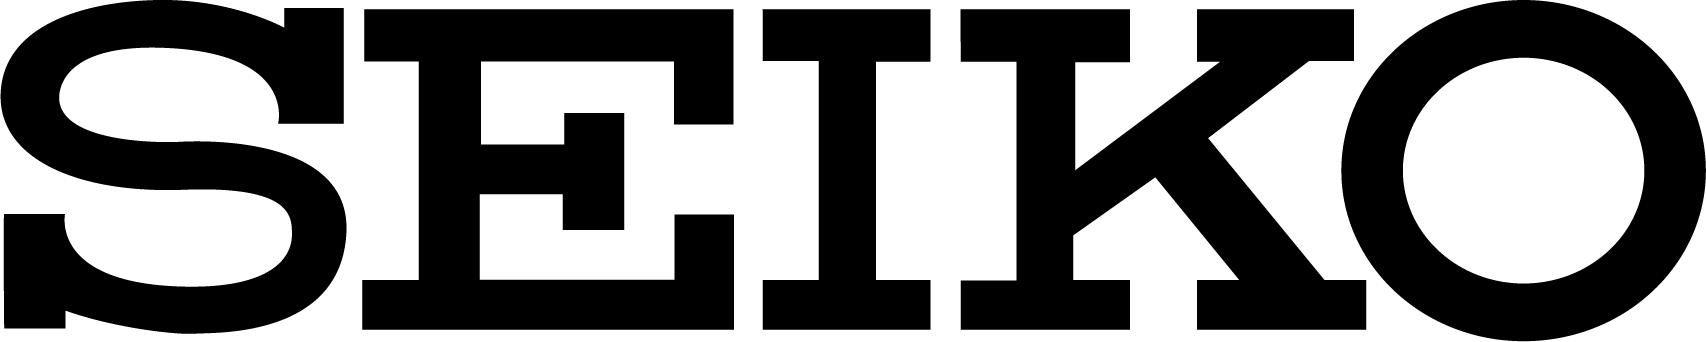 Seiko Rivenditori Italiani - Casavola Noci - Logo